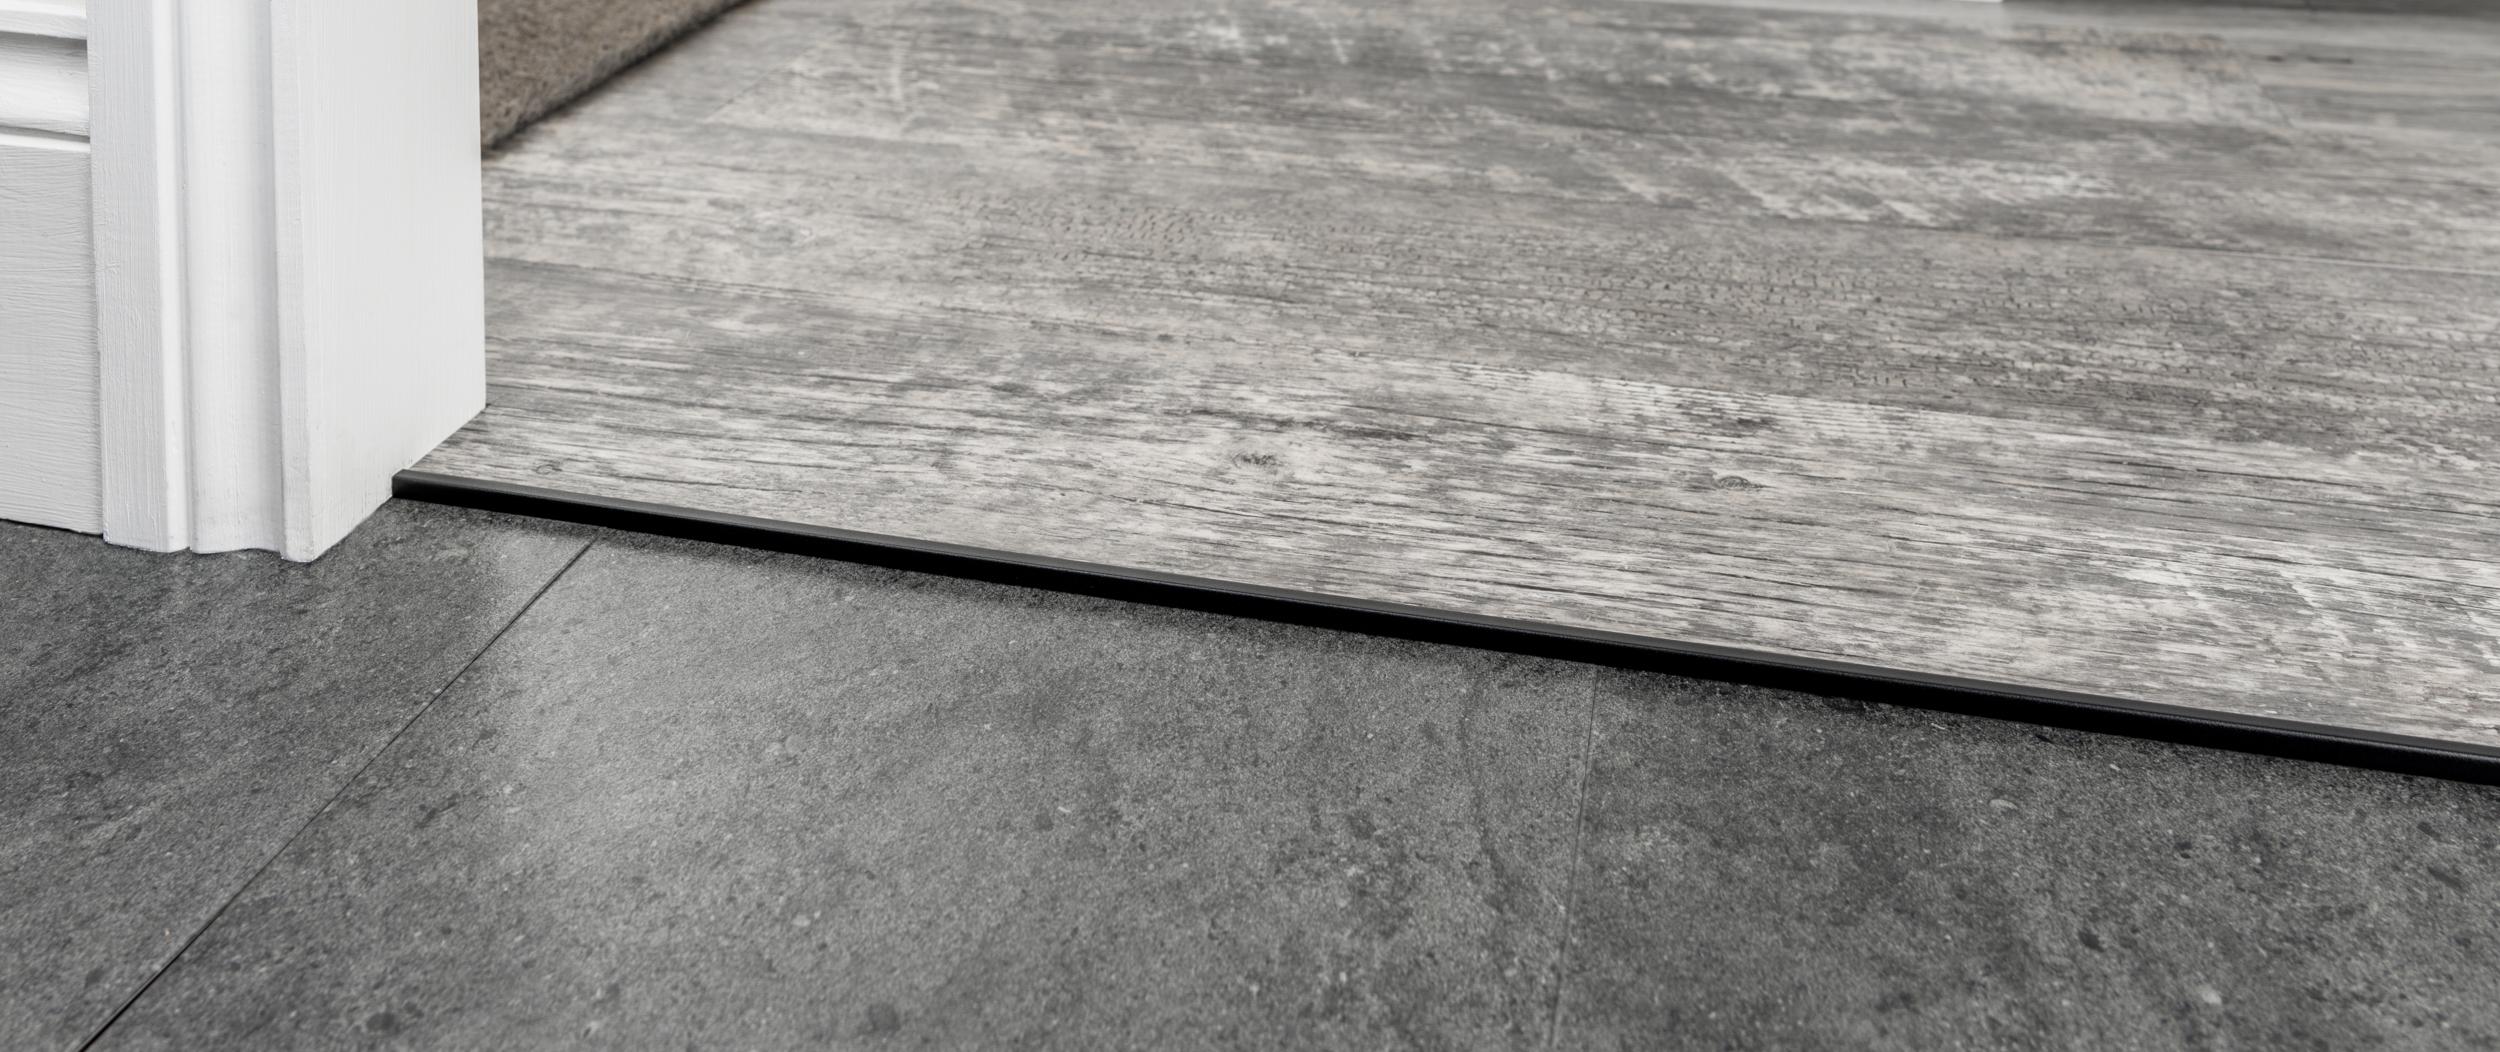 stairrods-black-square-cap-HTH.jpg